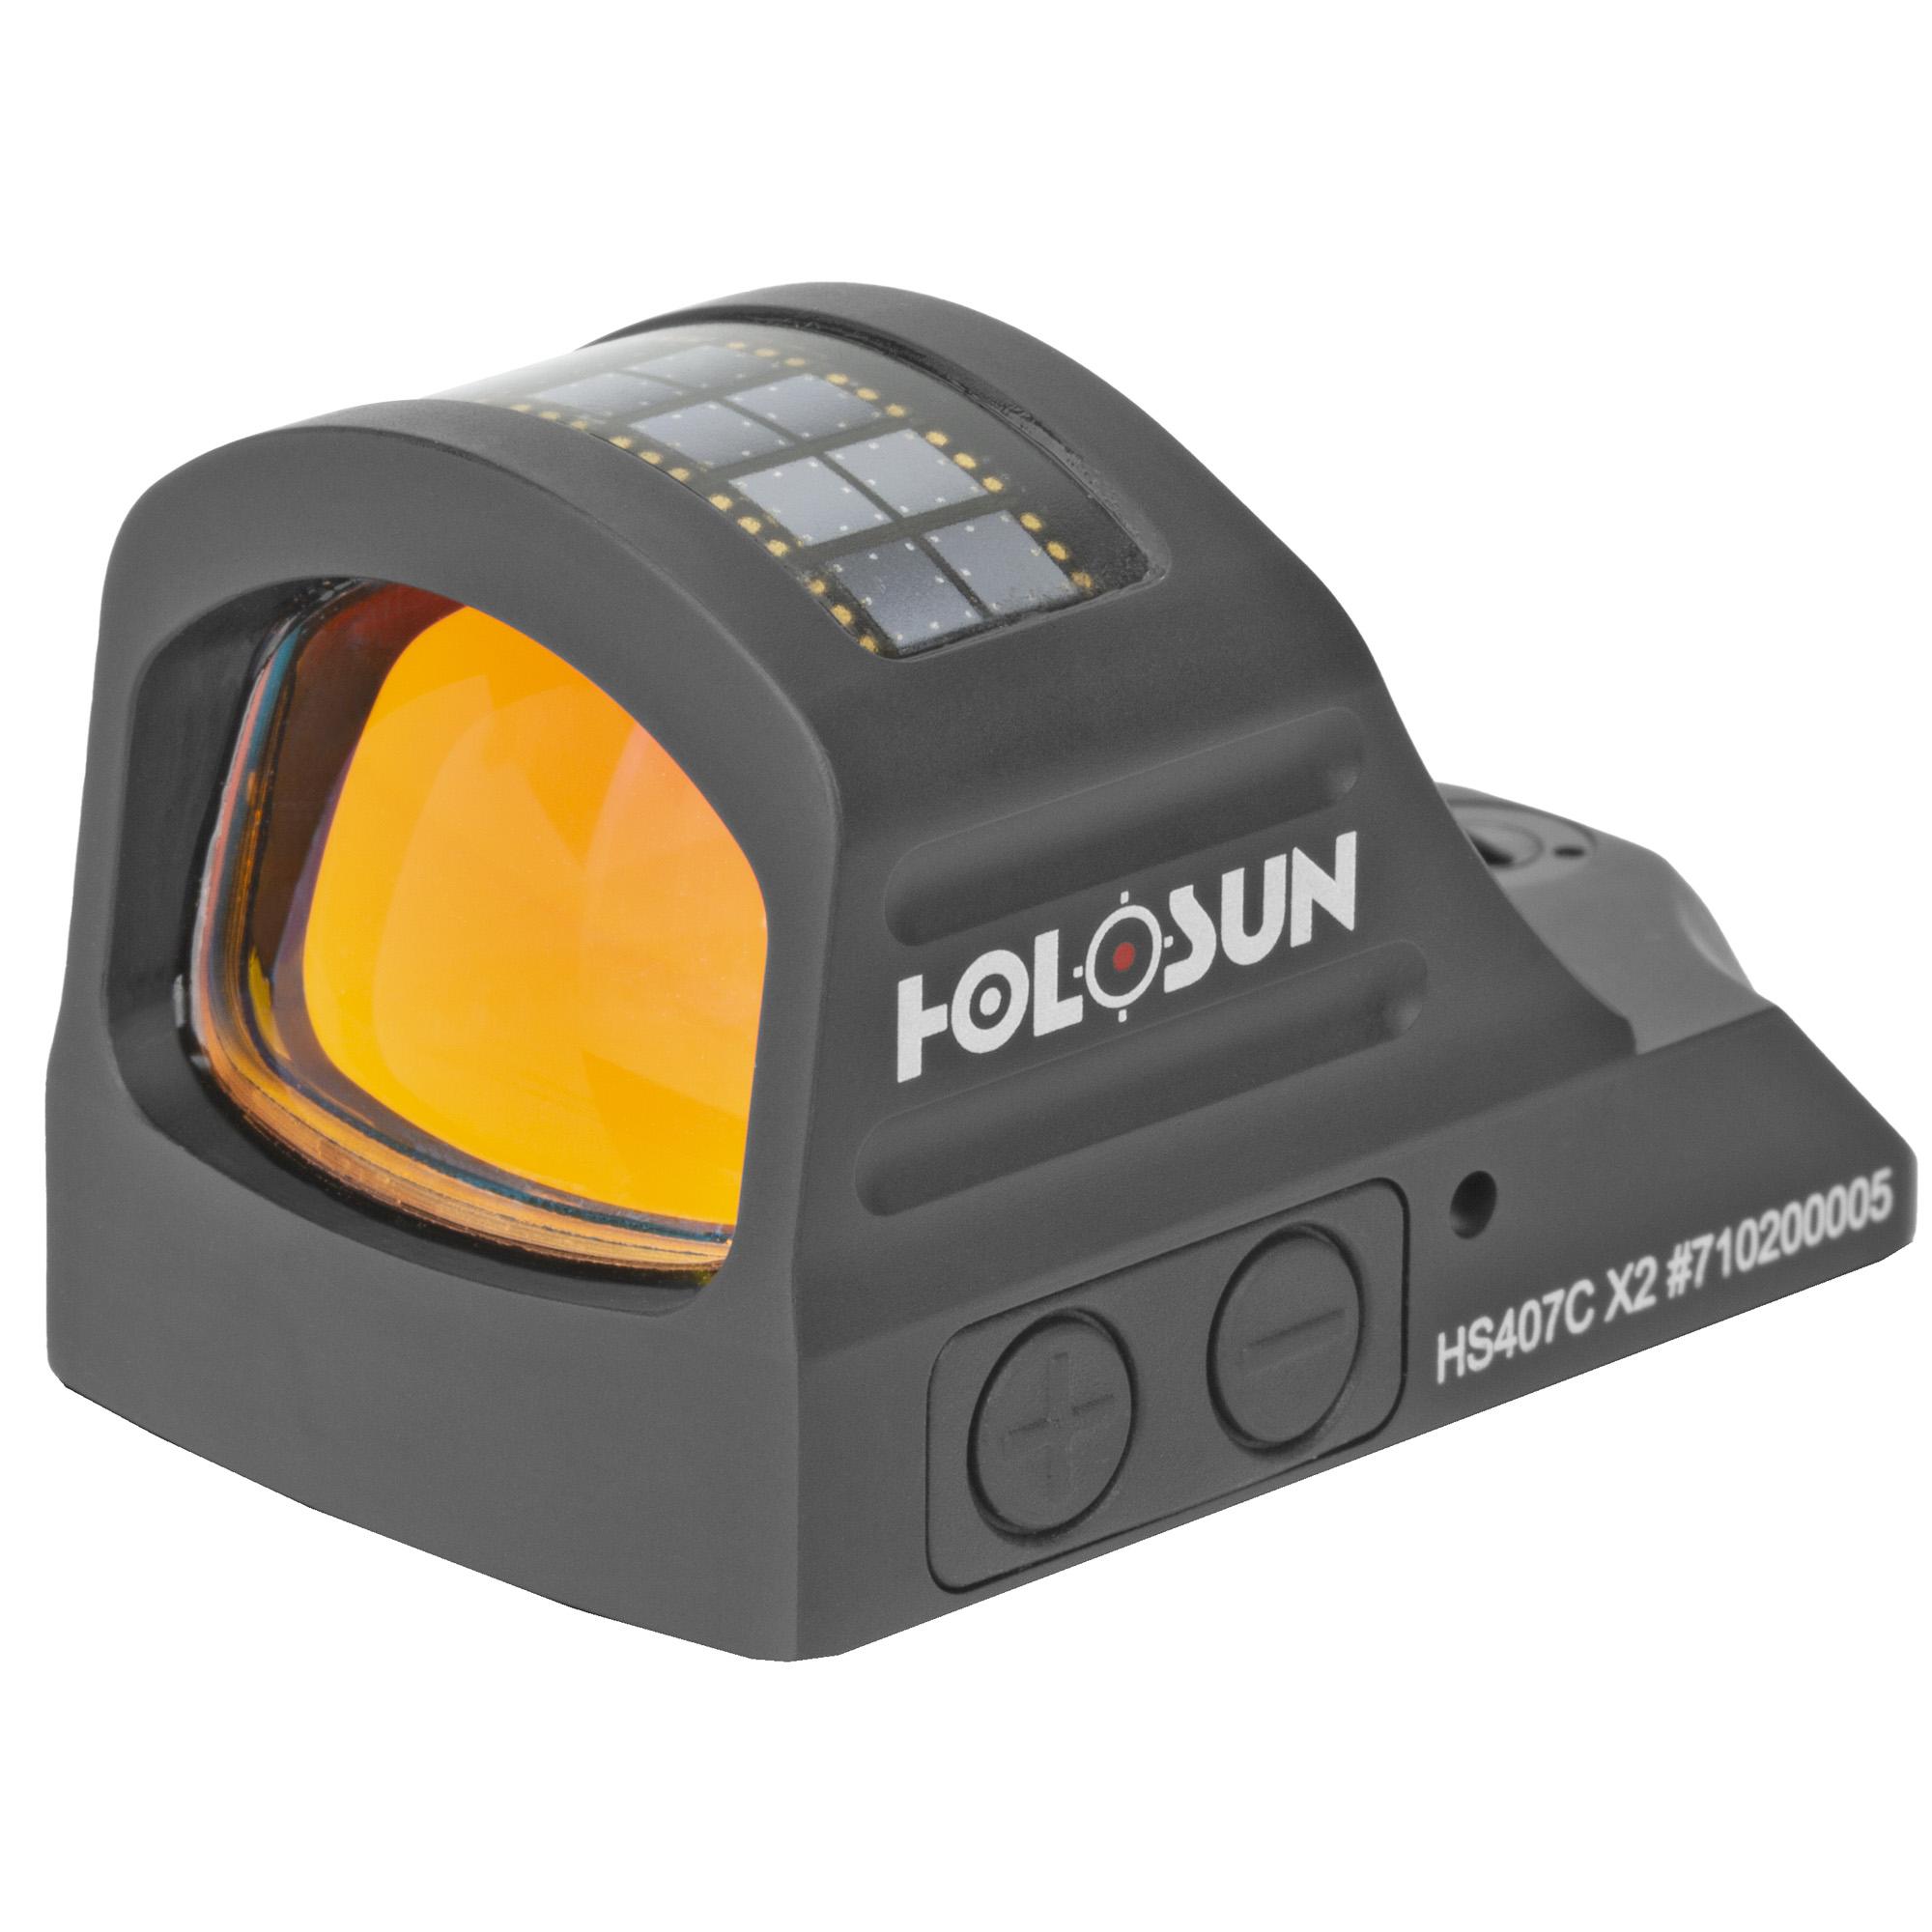 Holosun HS407C-X2 HS 407C-X2 Pistol 1x 2 MOA Red Dot Black Anodized Pistols